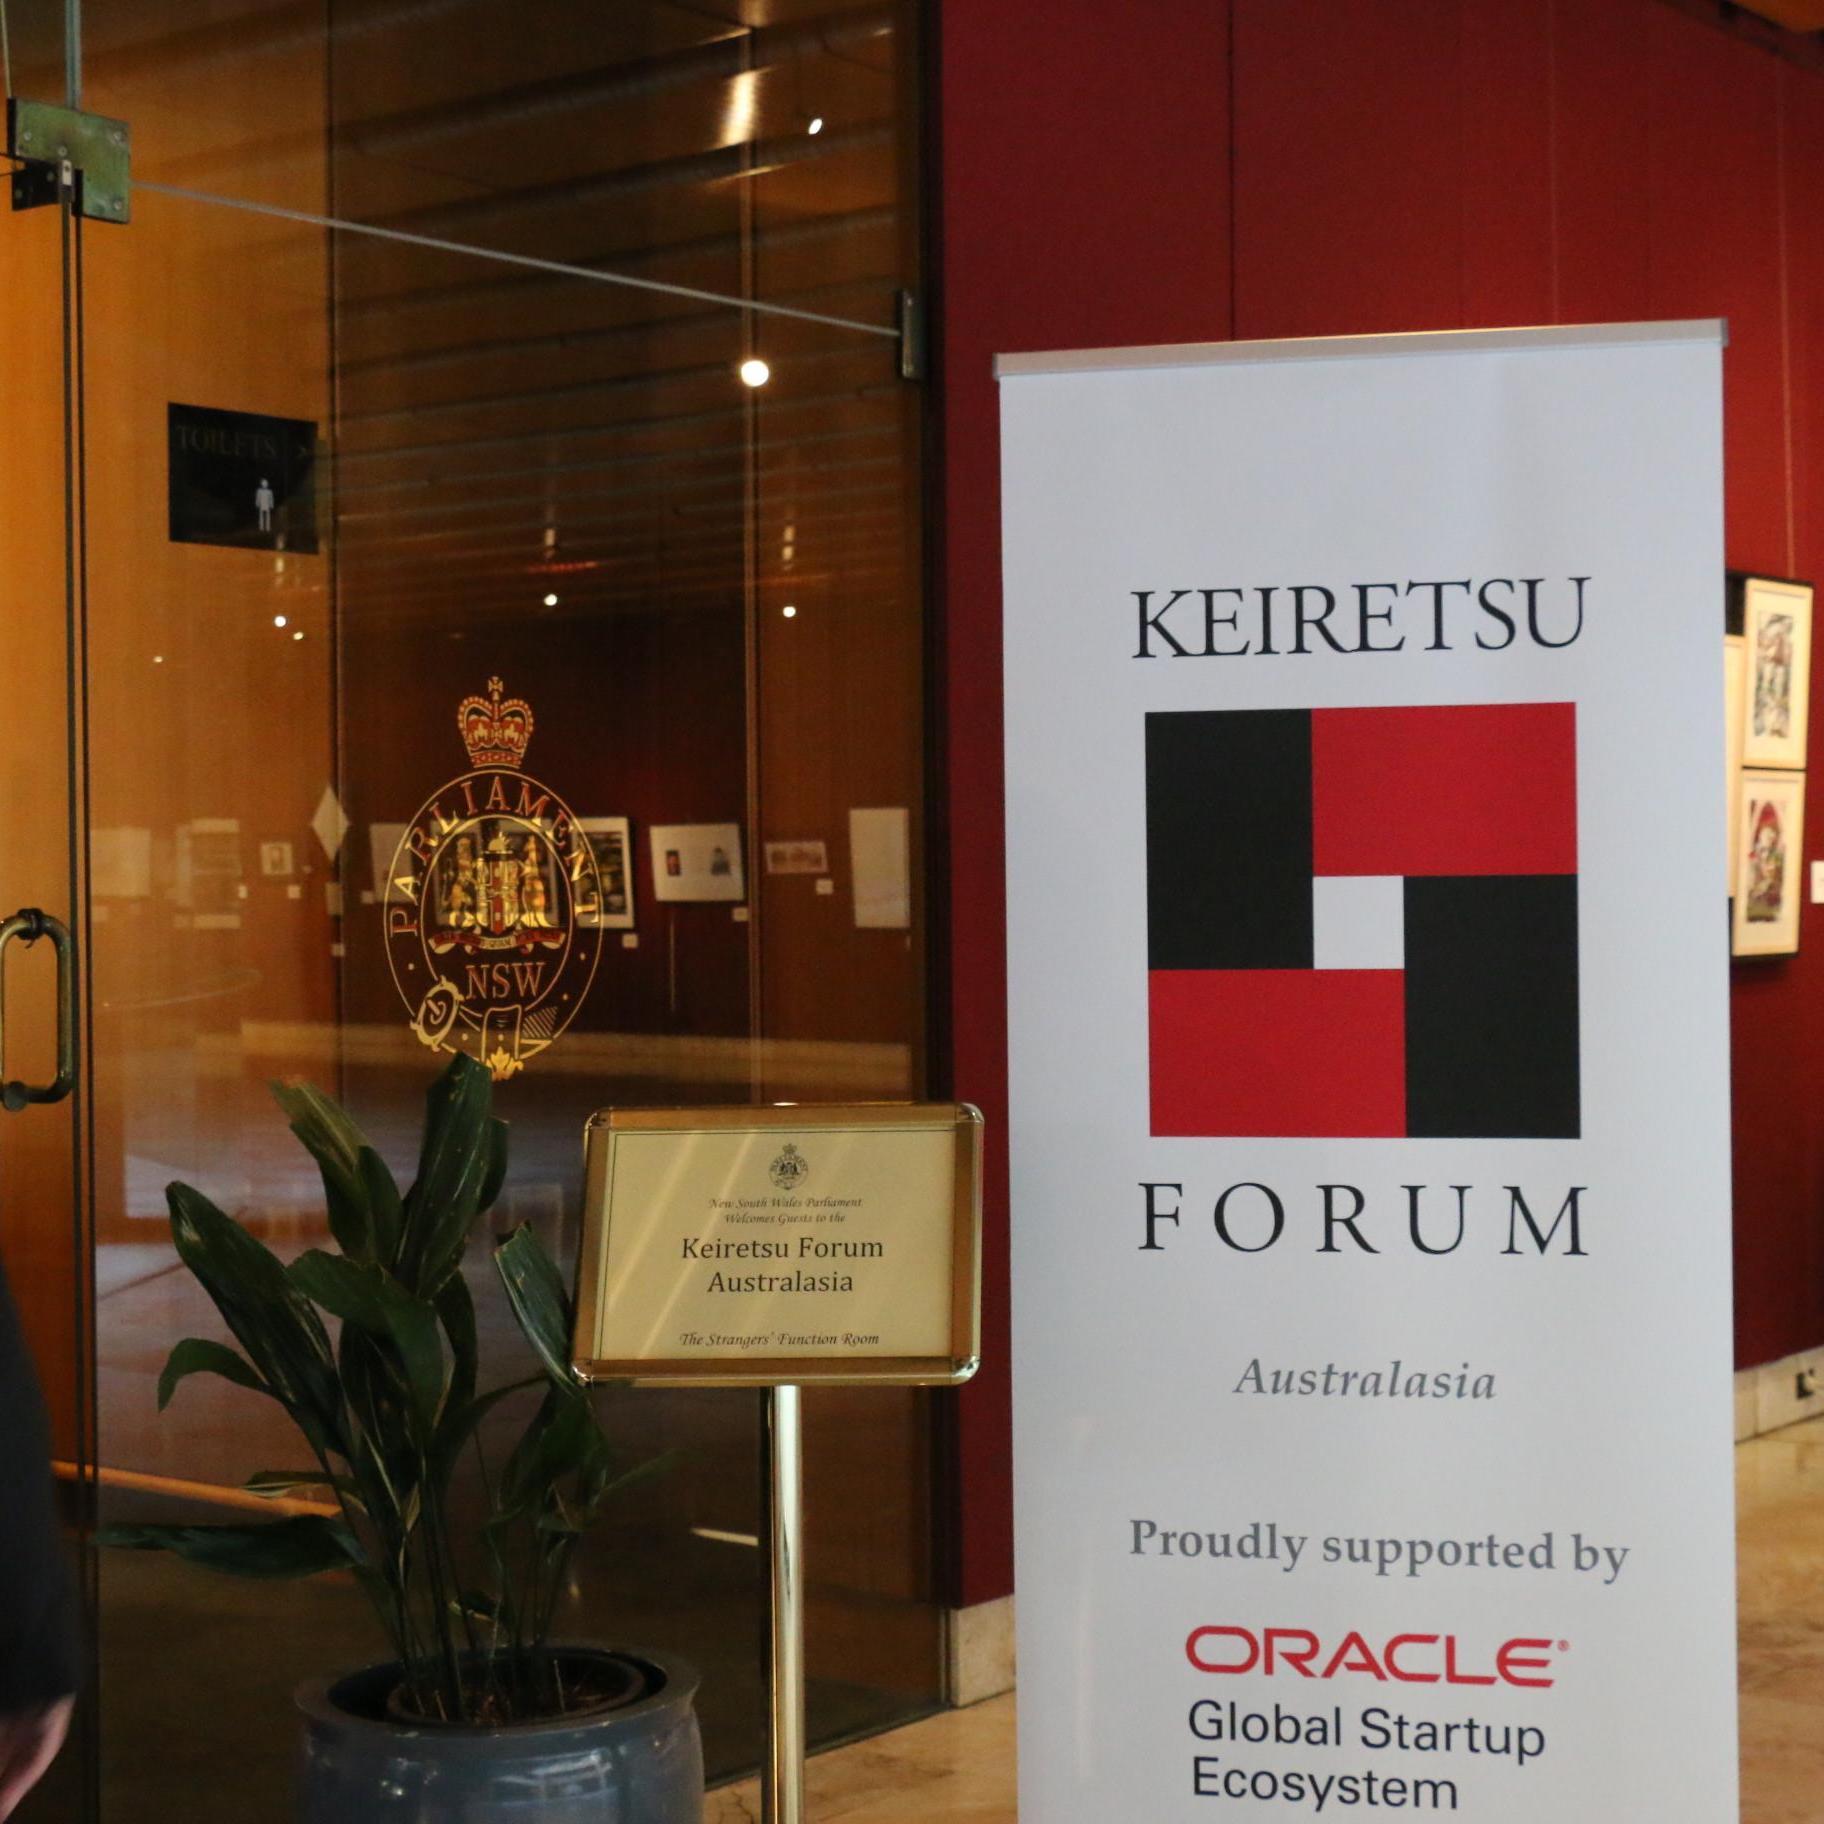 Keiretsu Forum Australasia Launch